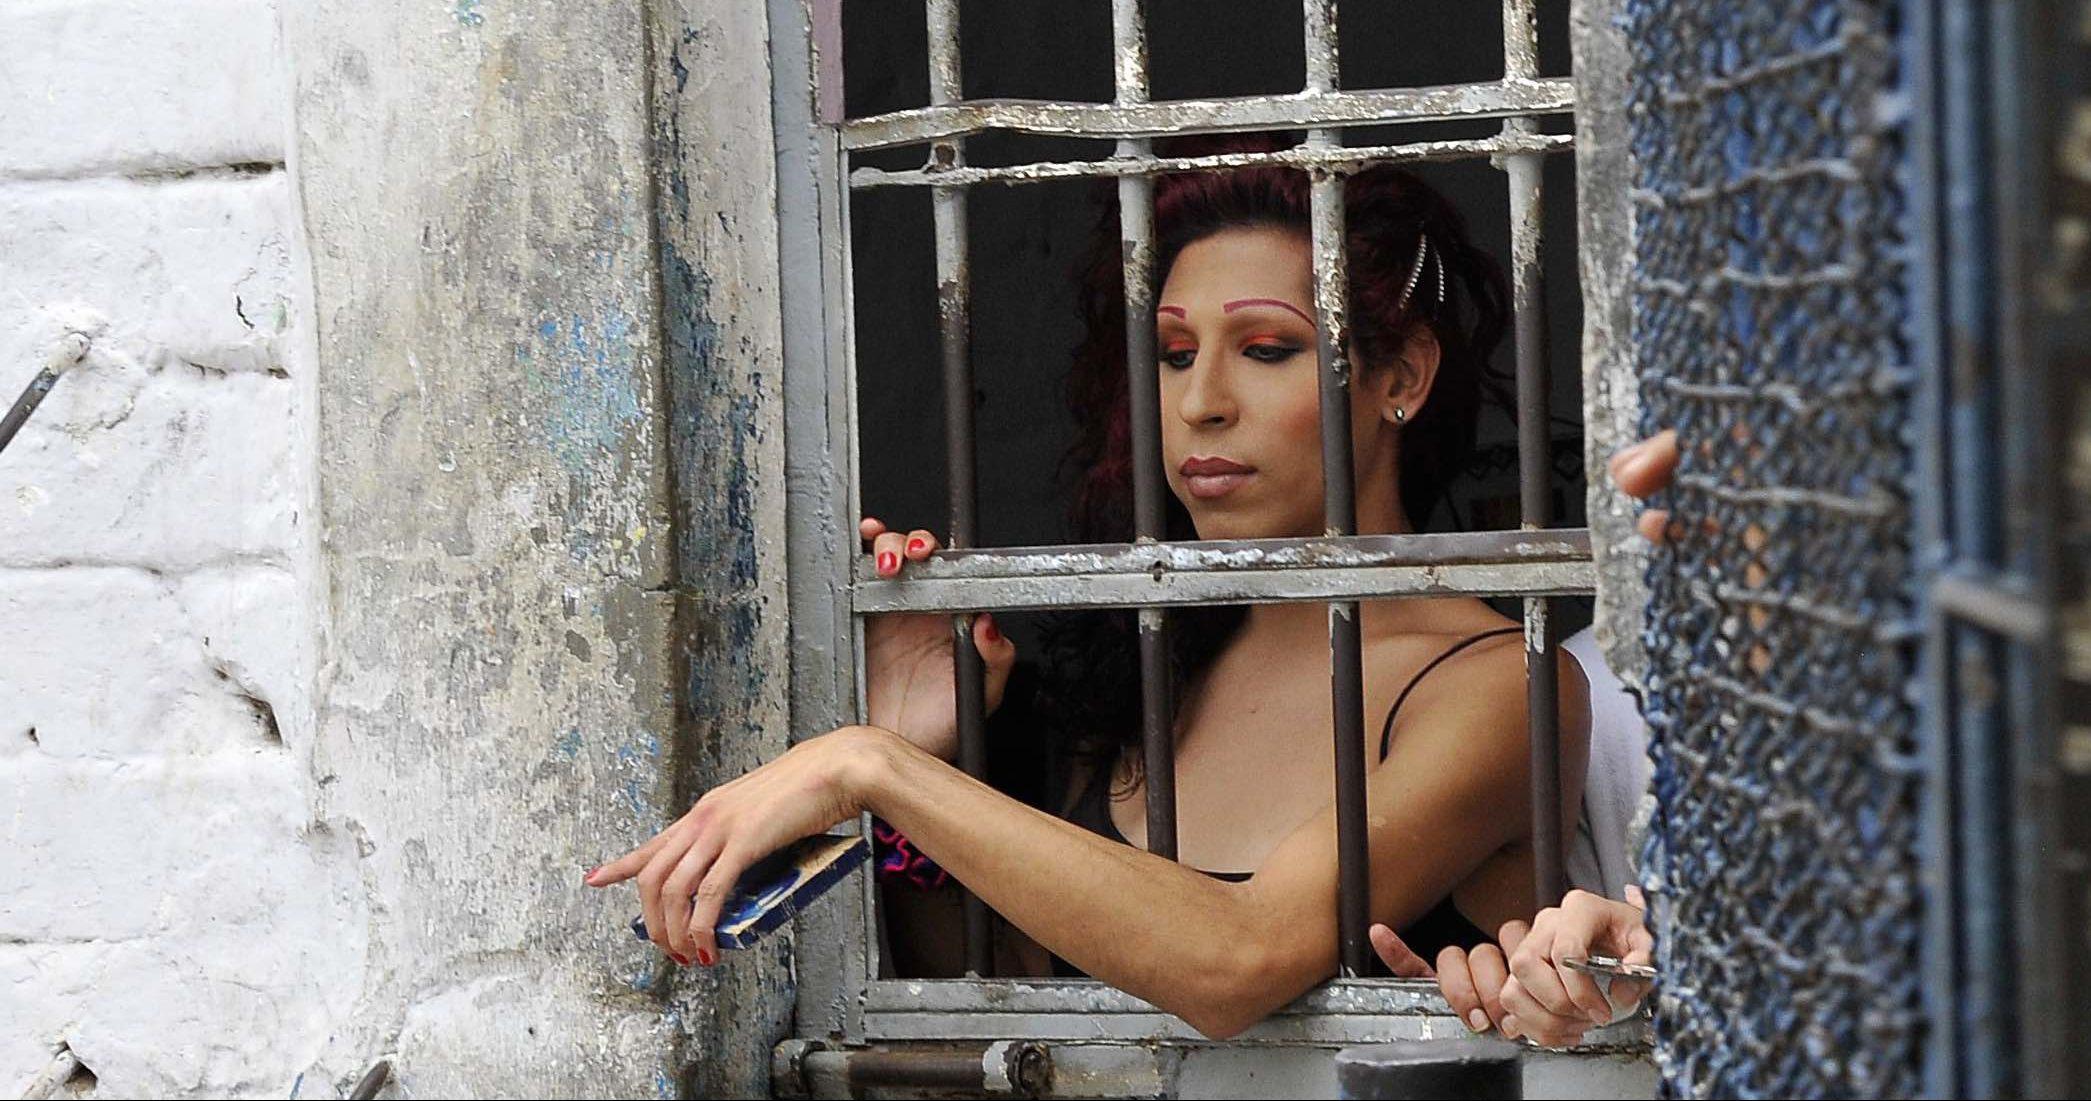 Prison pussy inspection, aishwariya porn